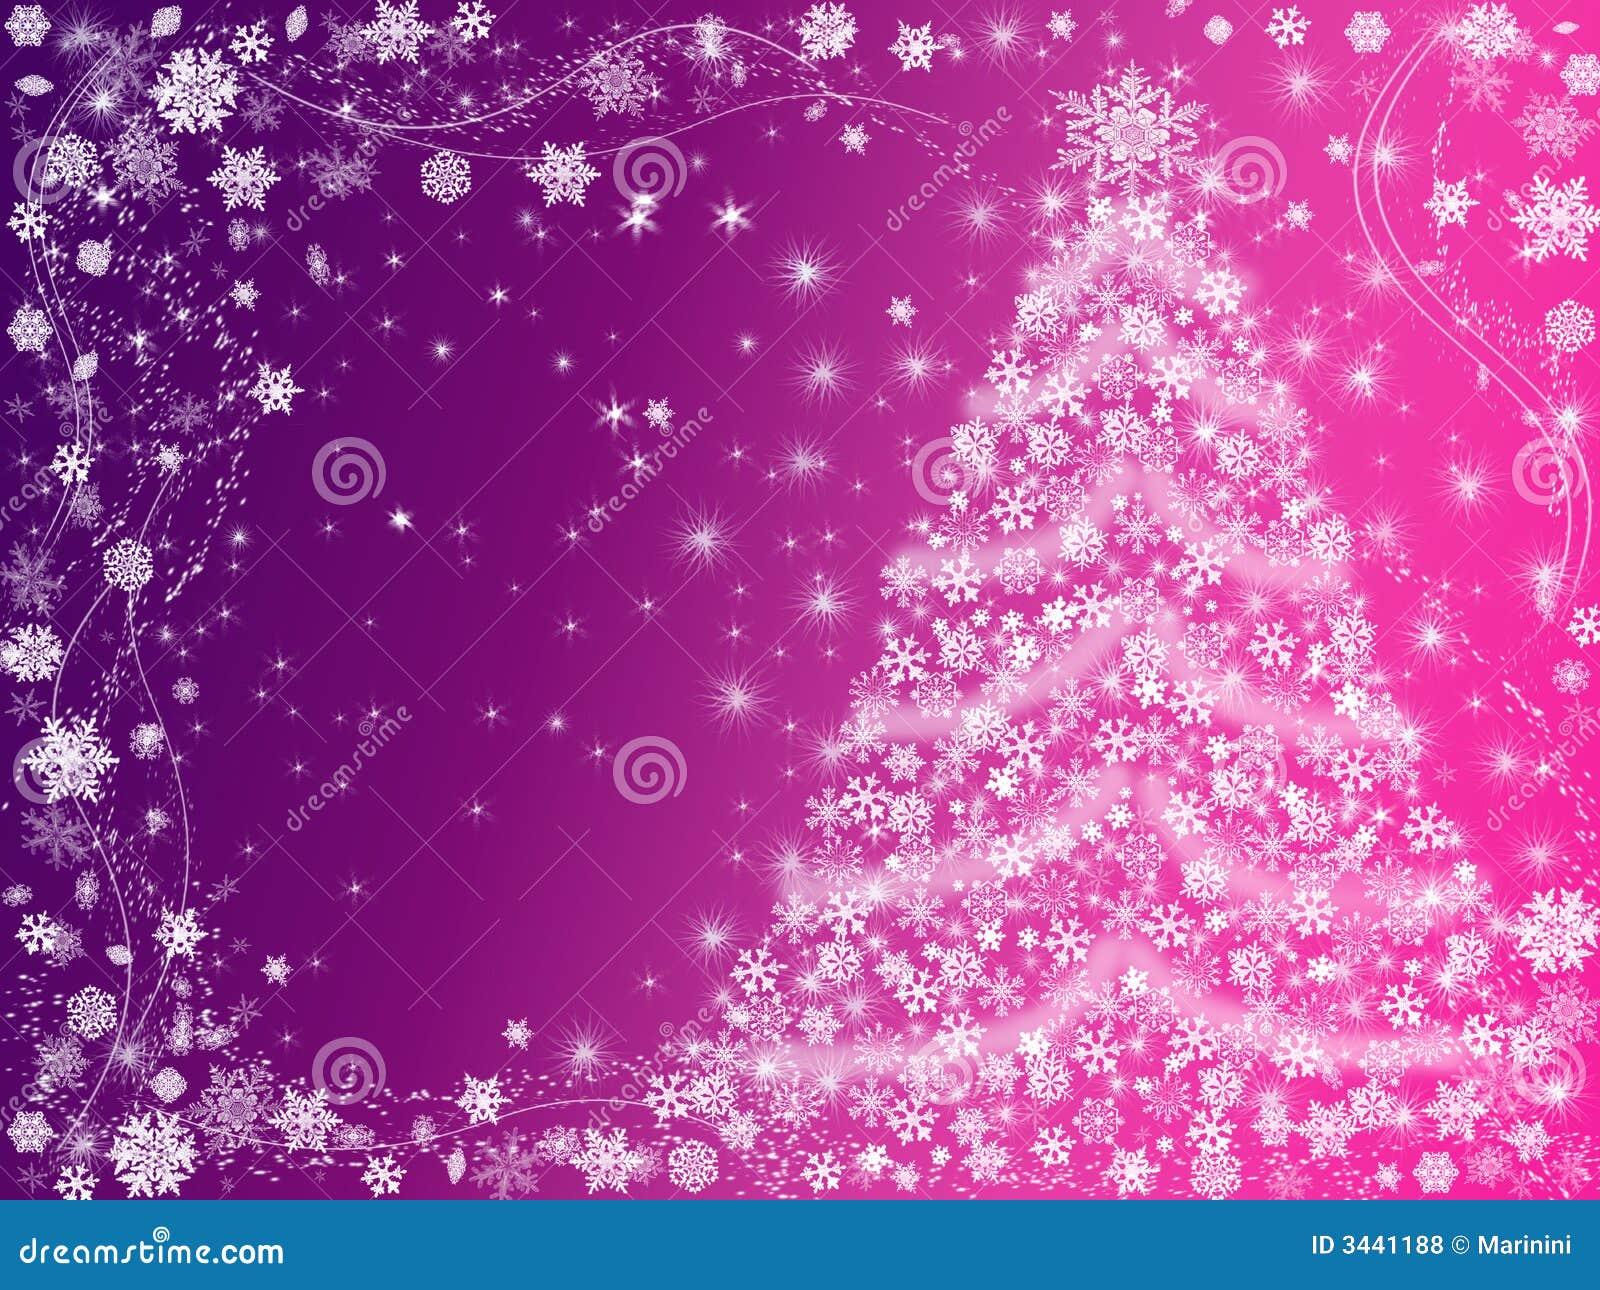 Imagenes De Navidad En Color | Bernadettes